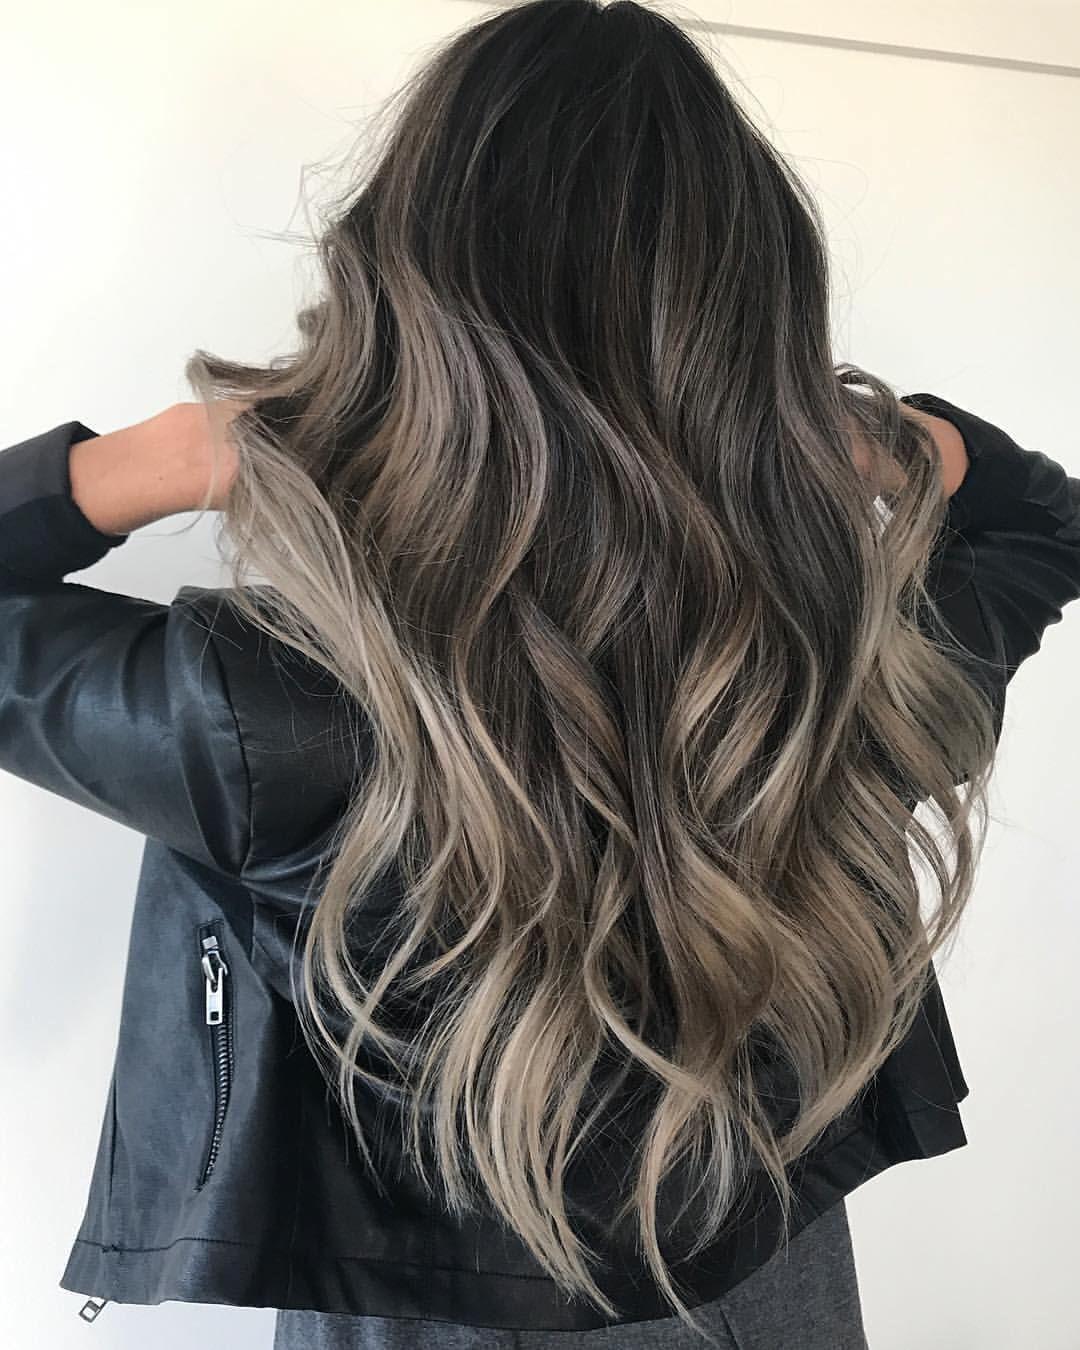 1 798 Likes 15 Comments X O F A R H A N A Xo Farhana Balayage On Instagram J O Y C E Spring Hair Color Beautiful Hair Color Hair Styles